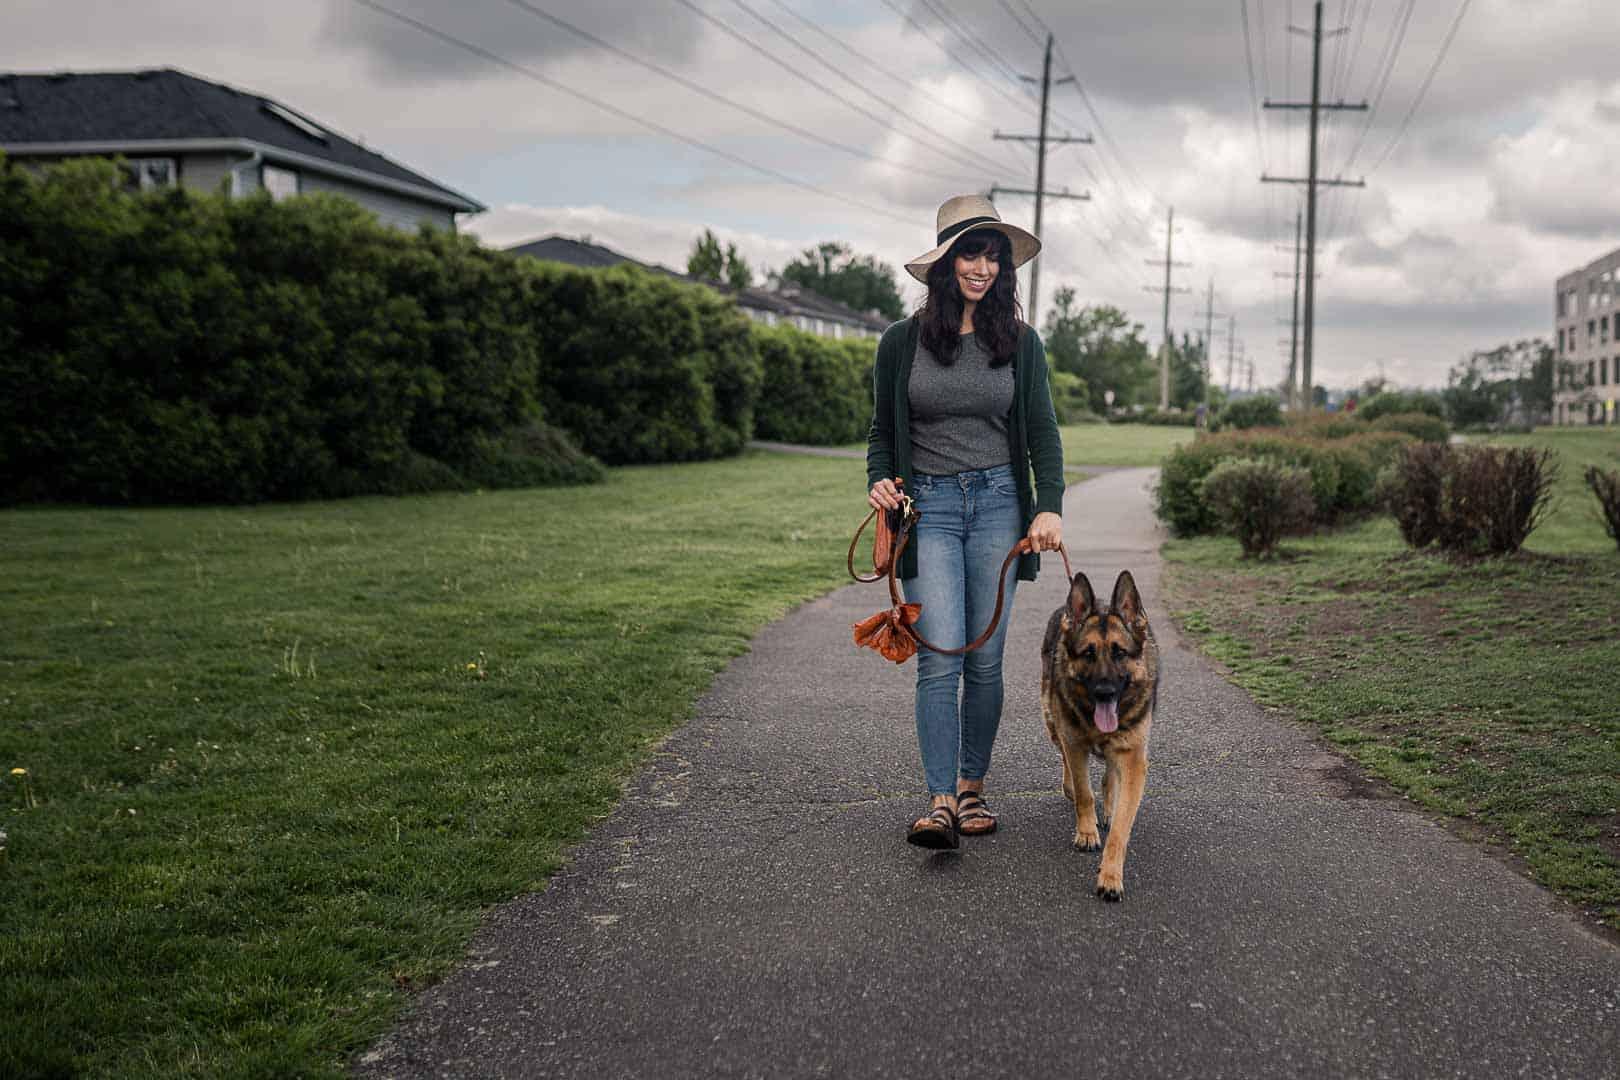 Ecosafe Green | Zero waste - woman walking dog